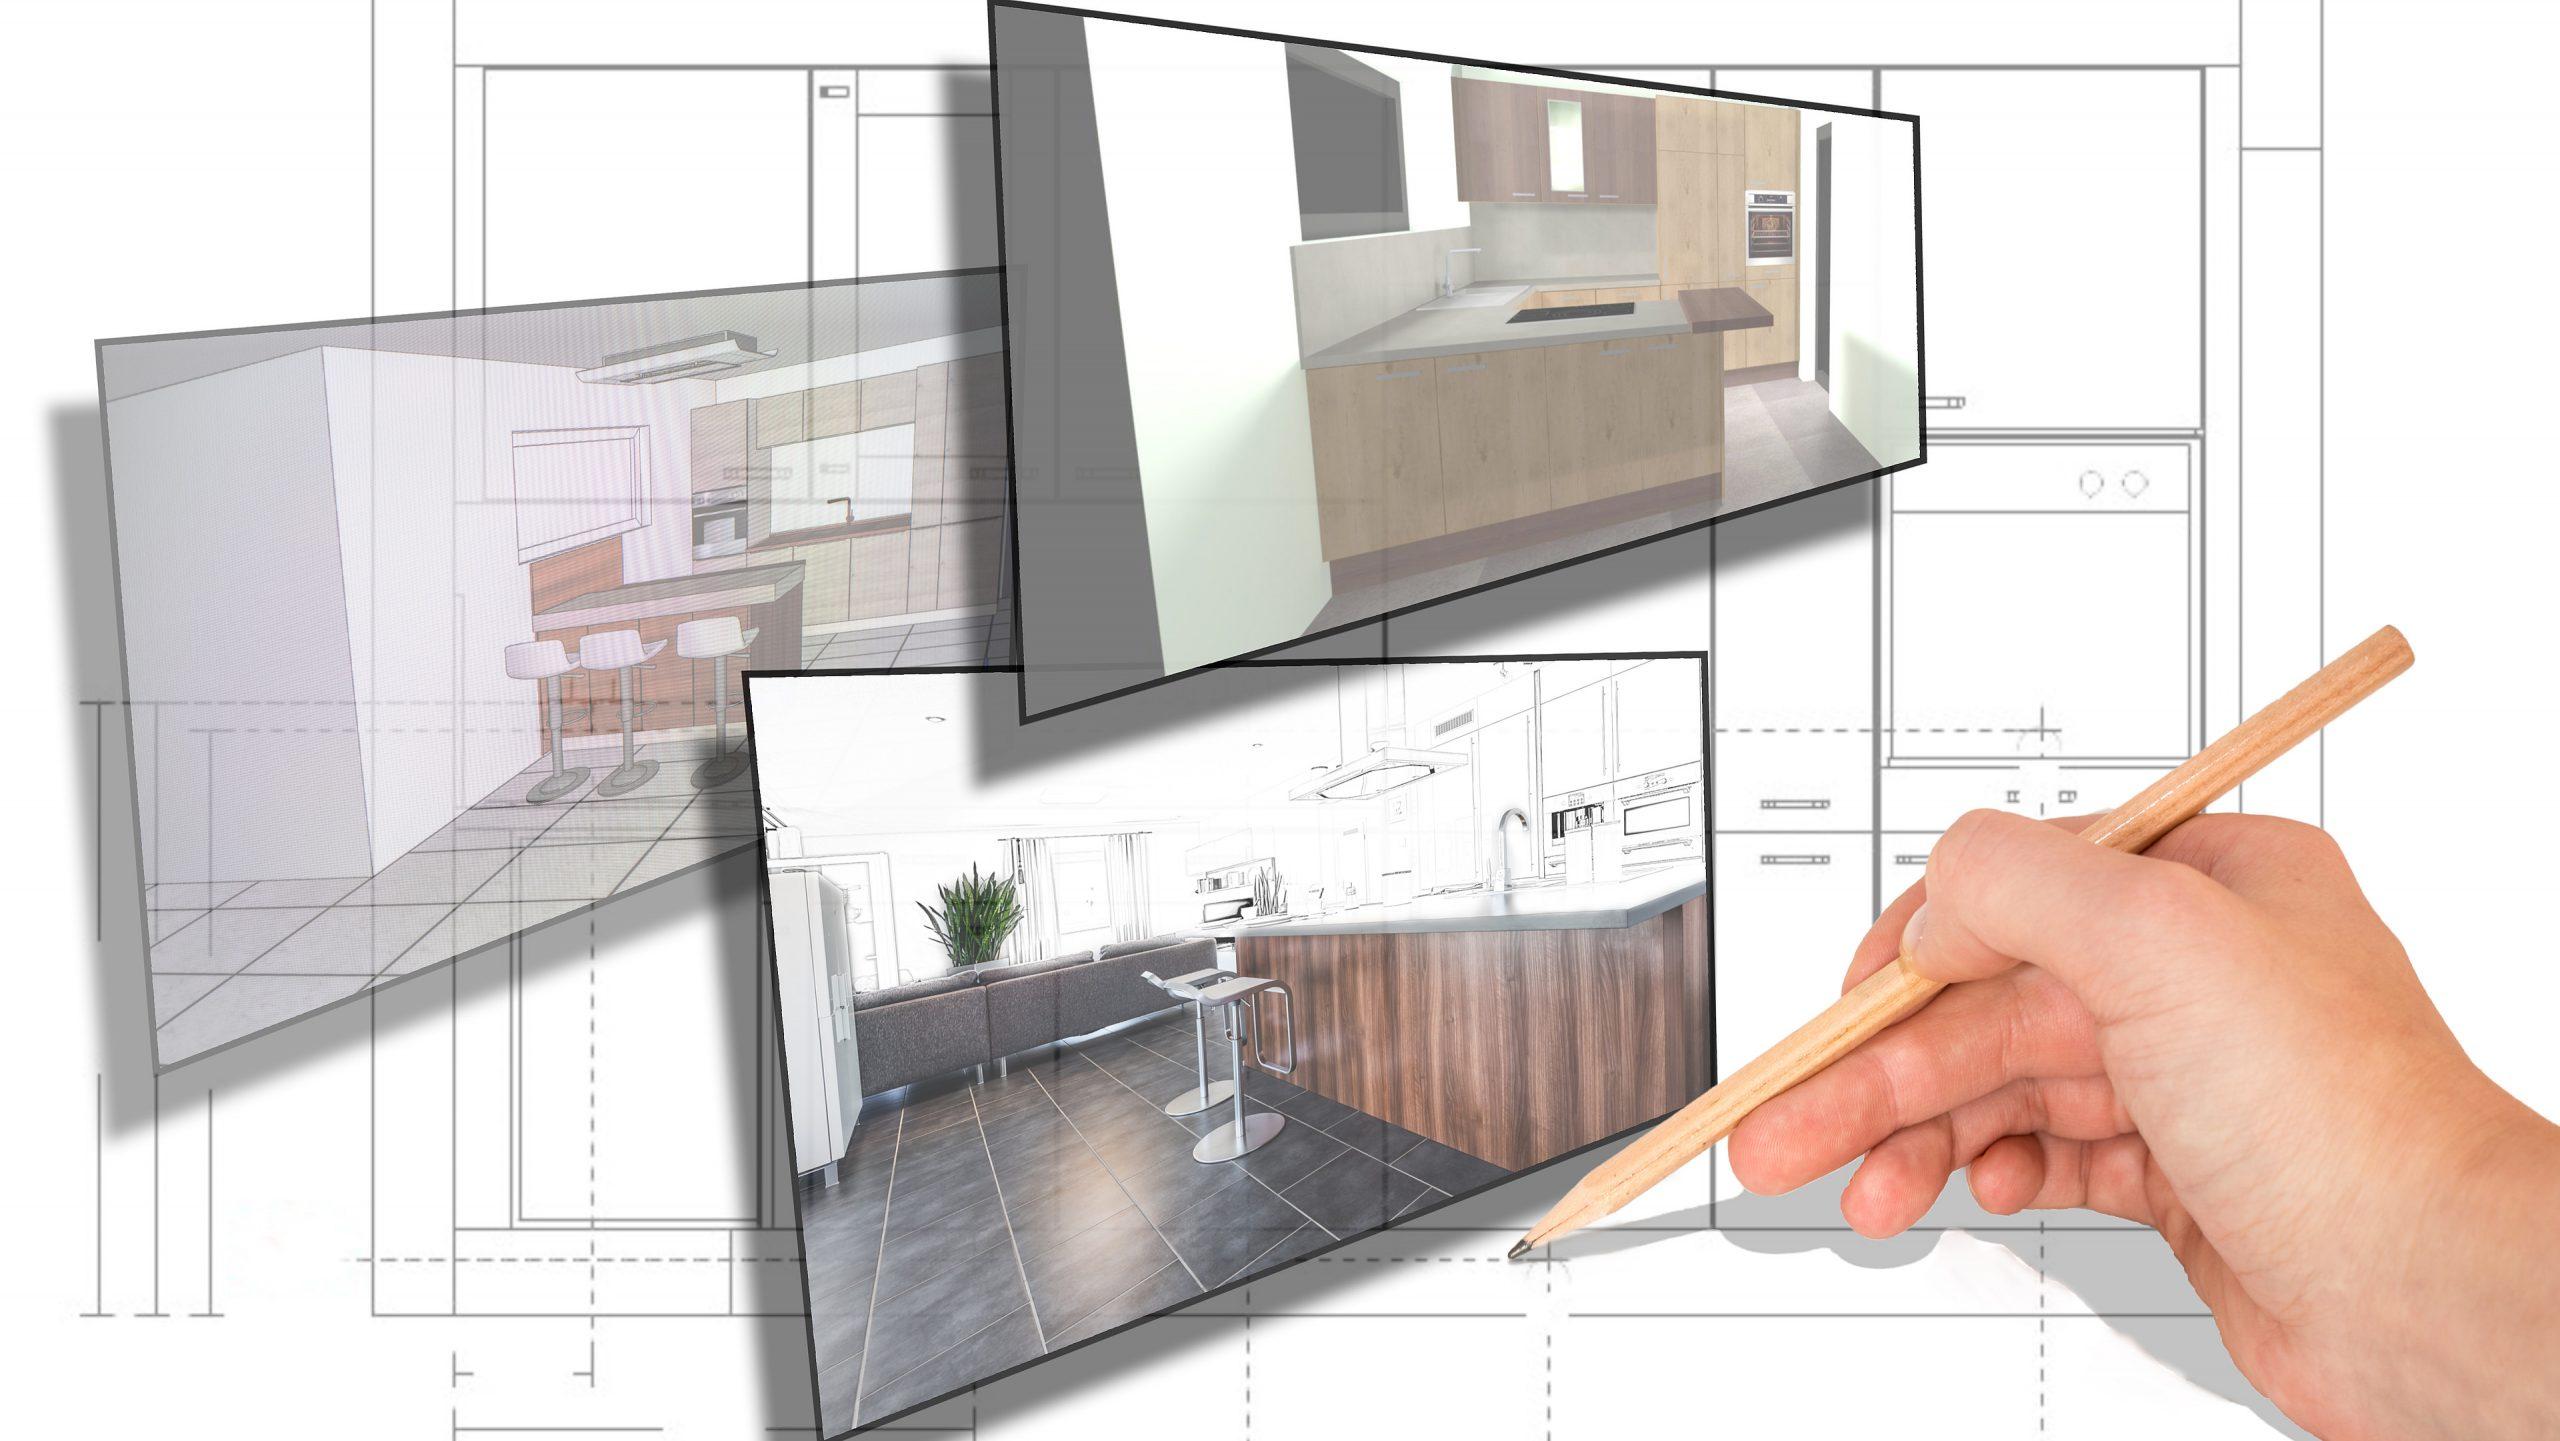 Full Size of Küche Planen Freiburg Ikea Küche Planen Lassen Kosten Küche Planen Programm Download Mömax Küche Planen Küche Küche Planen